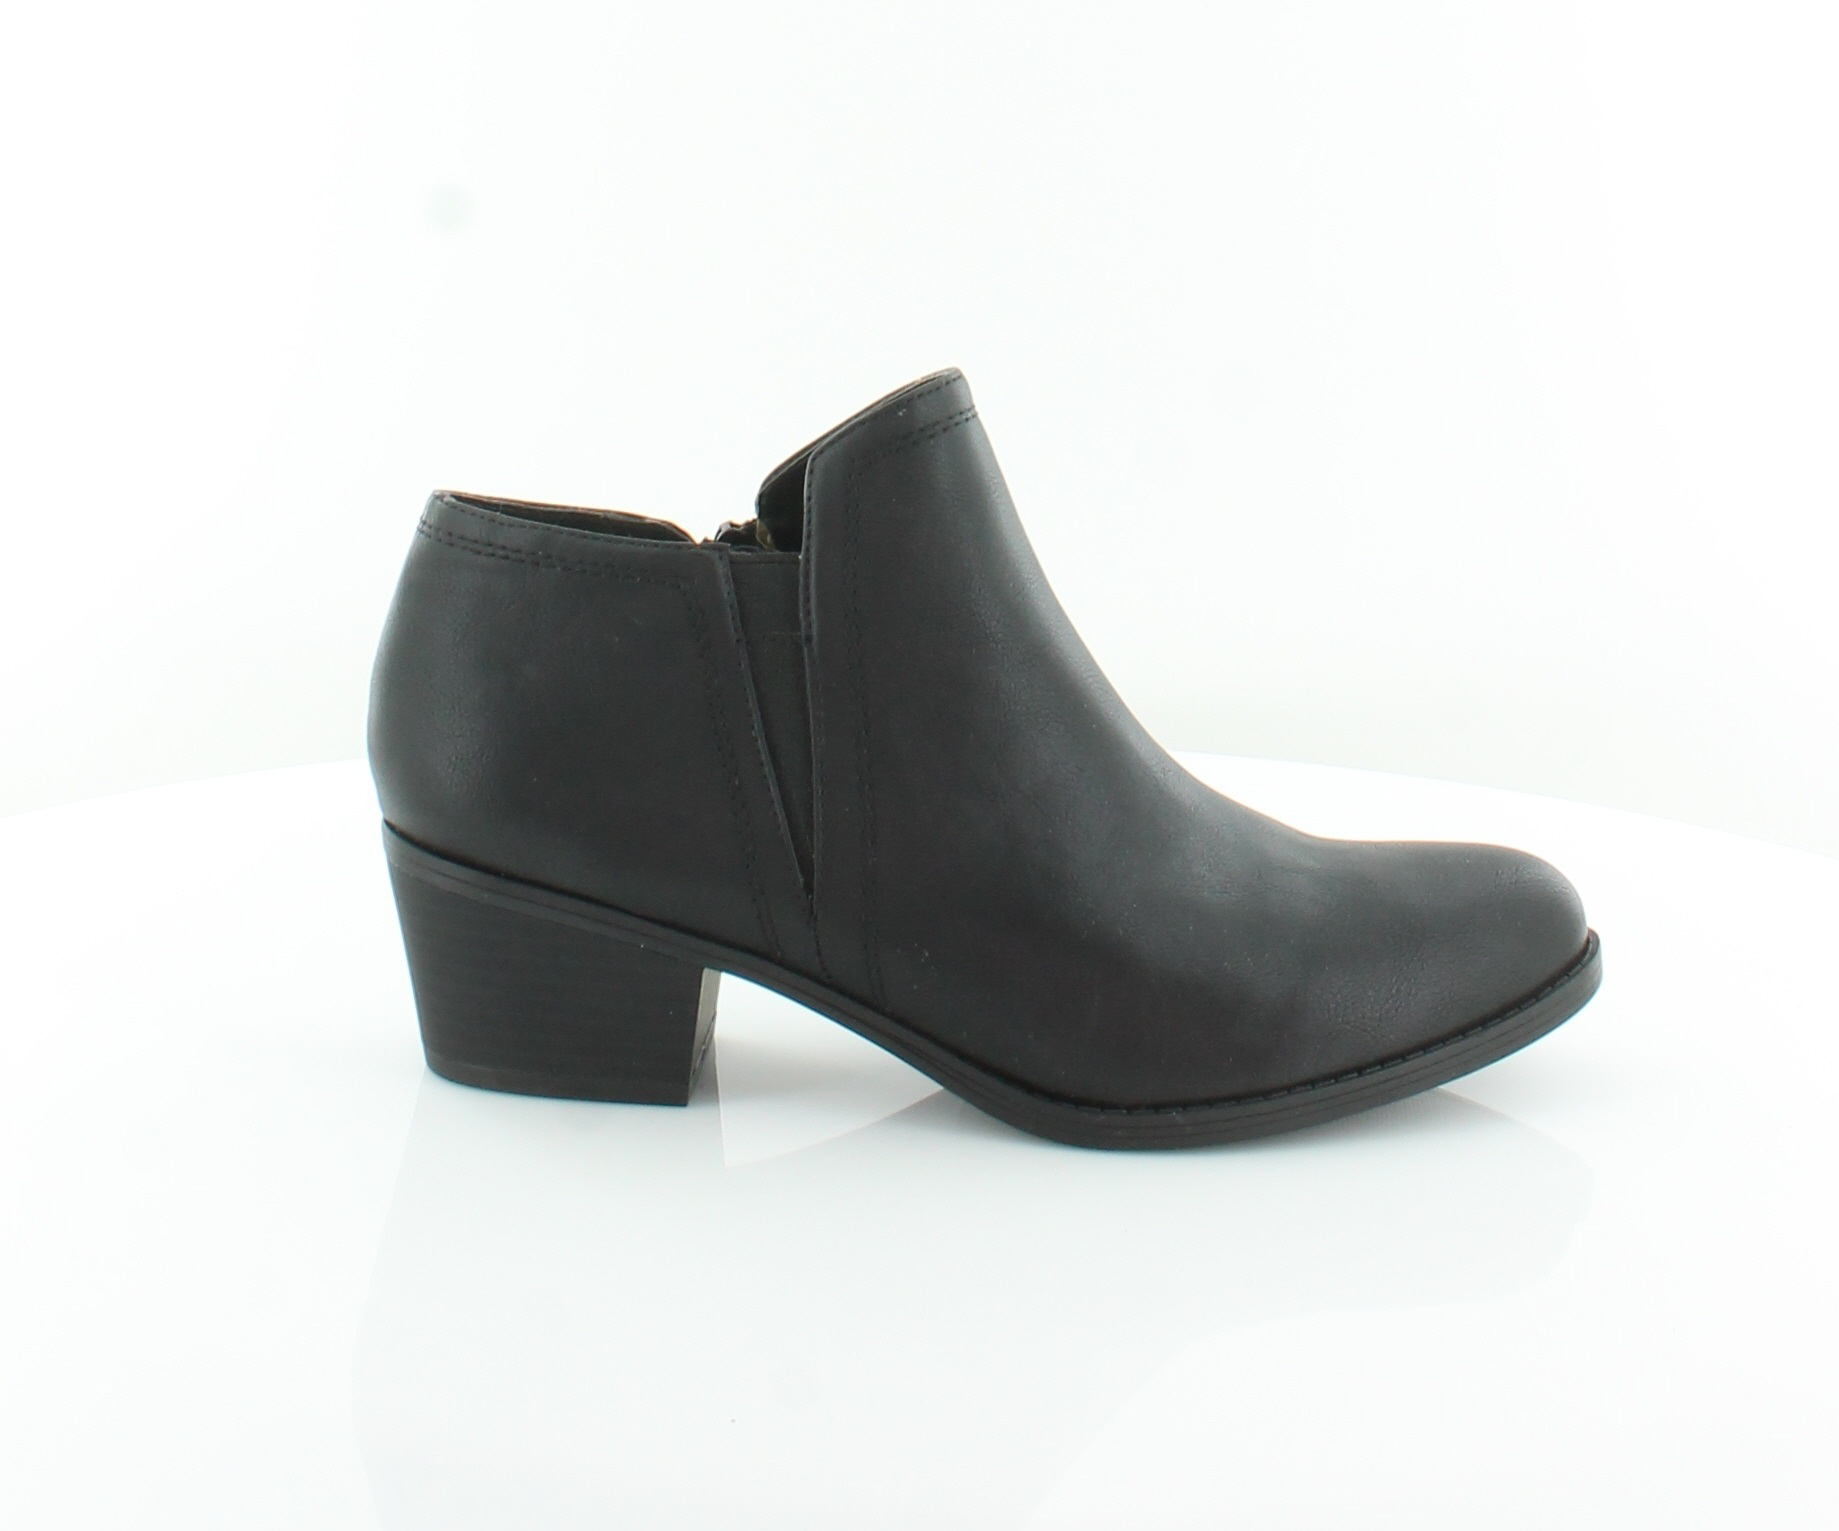 Naturalizer-Wonda2-Women-039-s-Boots-Black